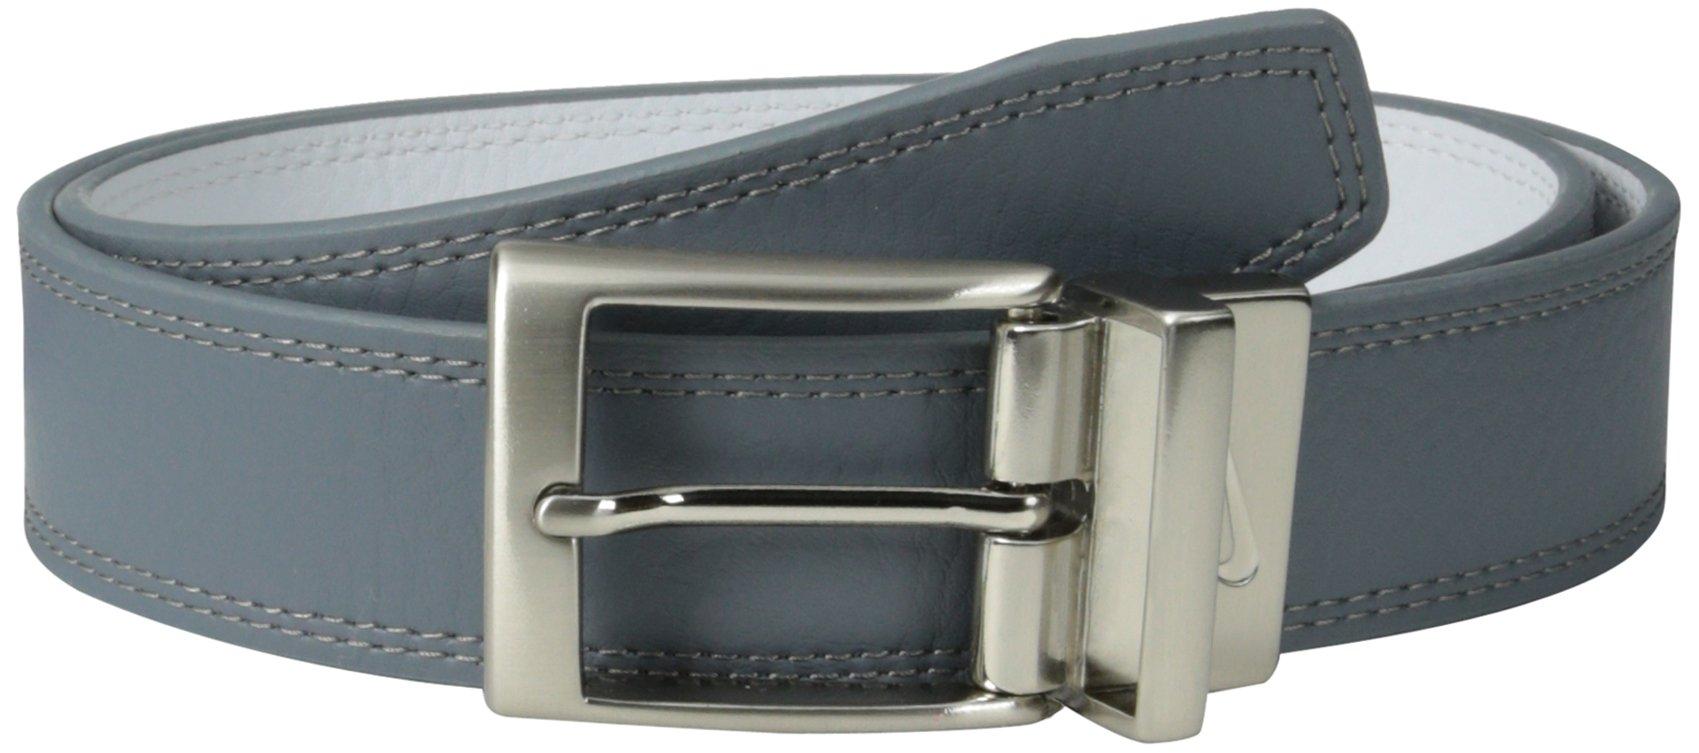 Nike Men's Classic Reversible Belt, Grey/White, 36